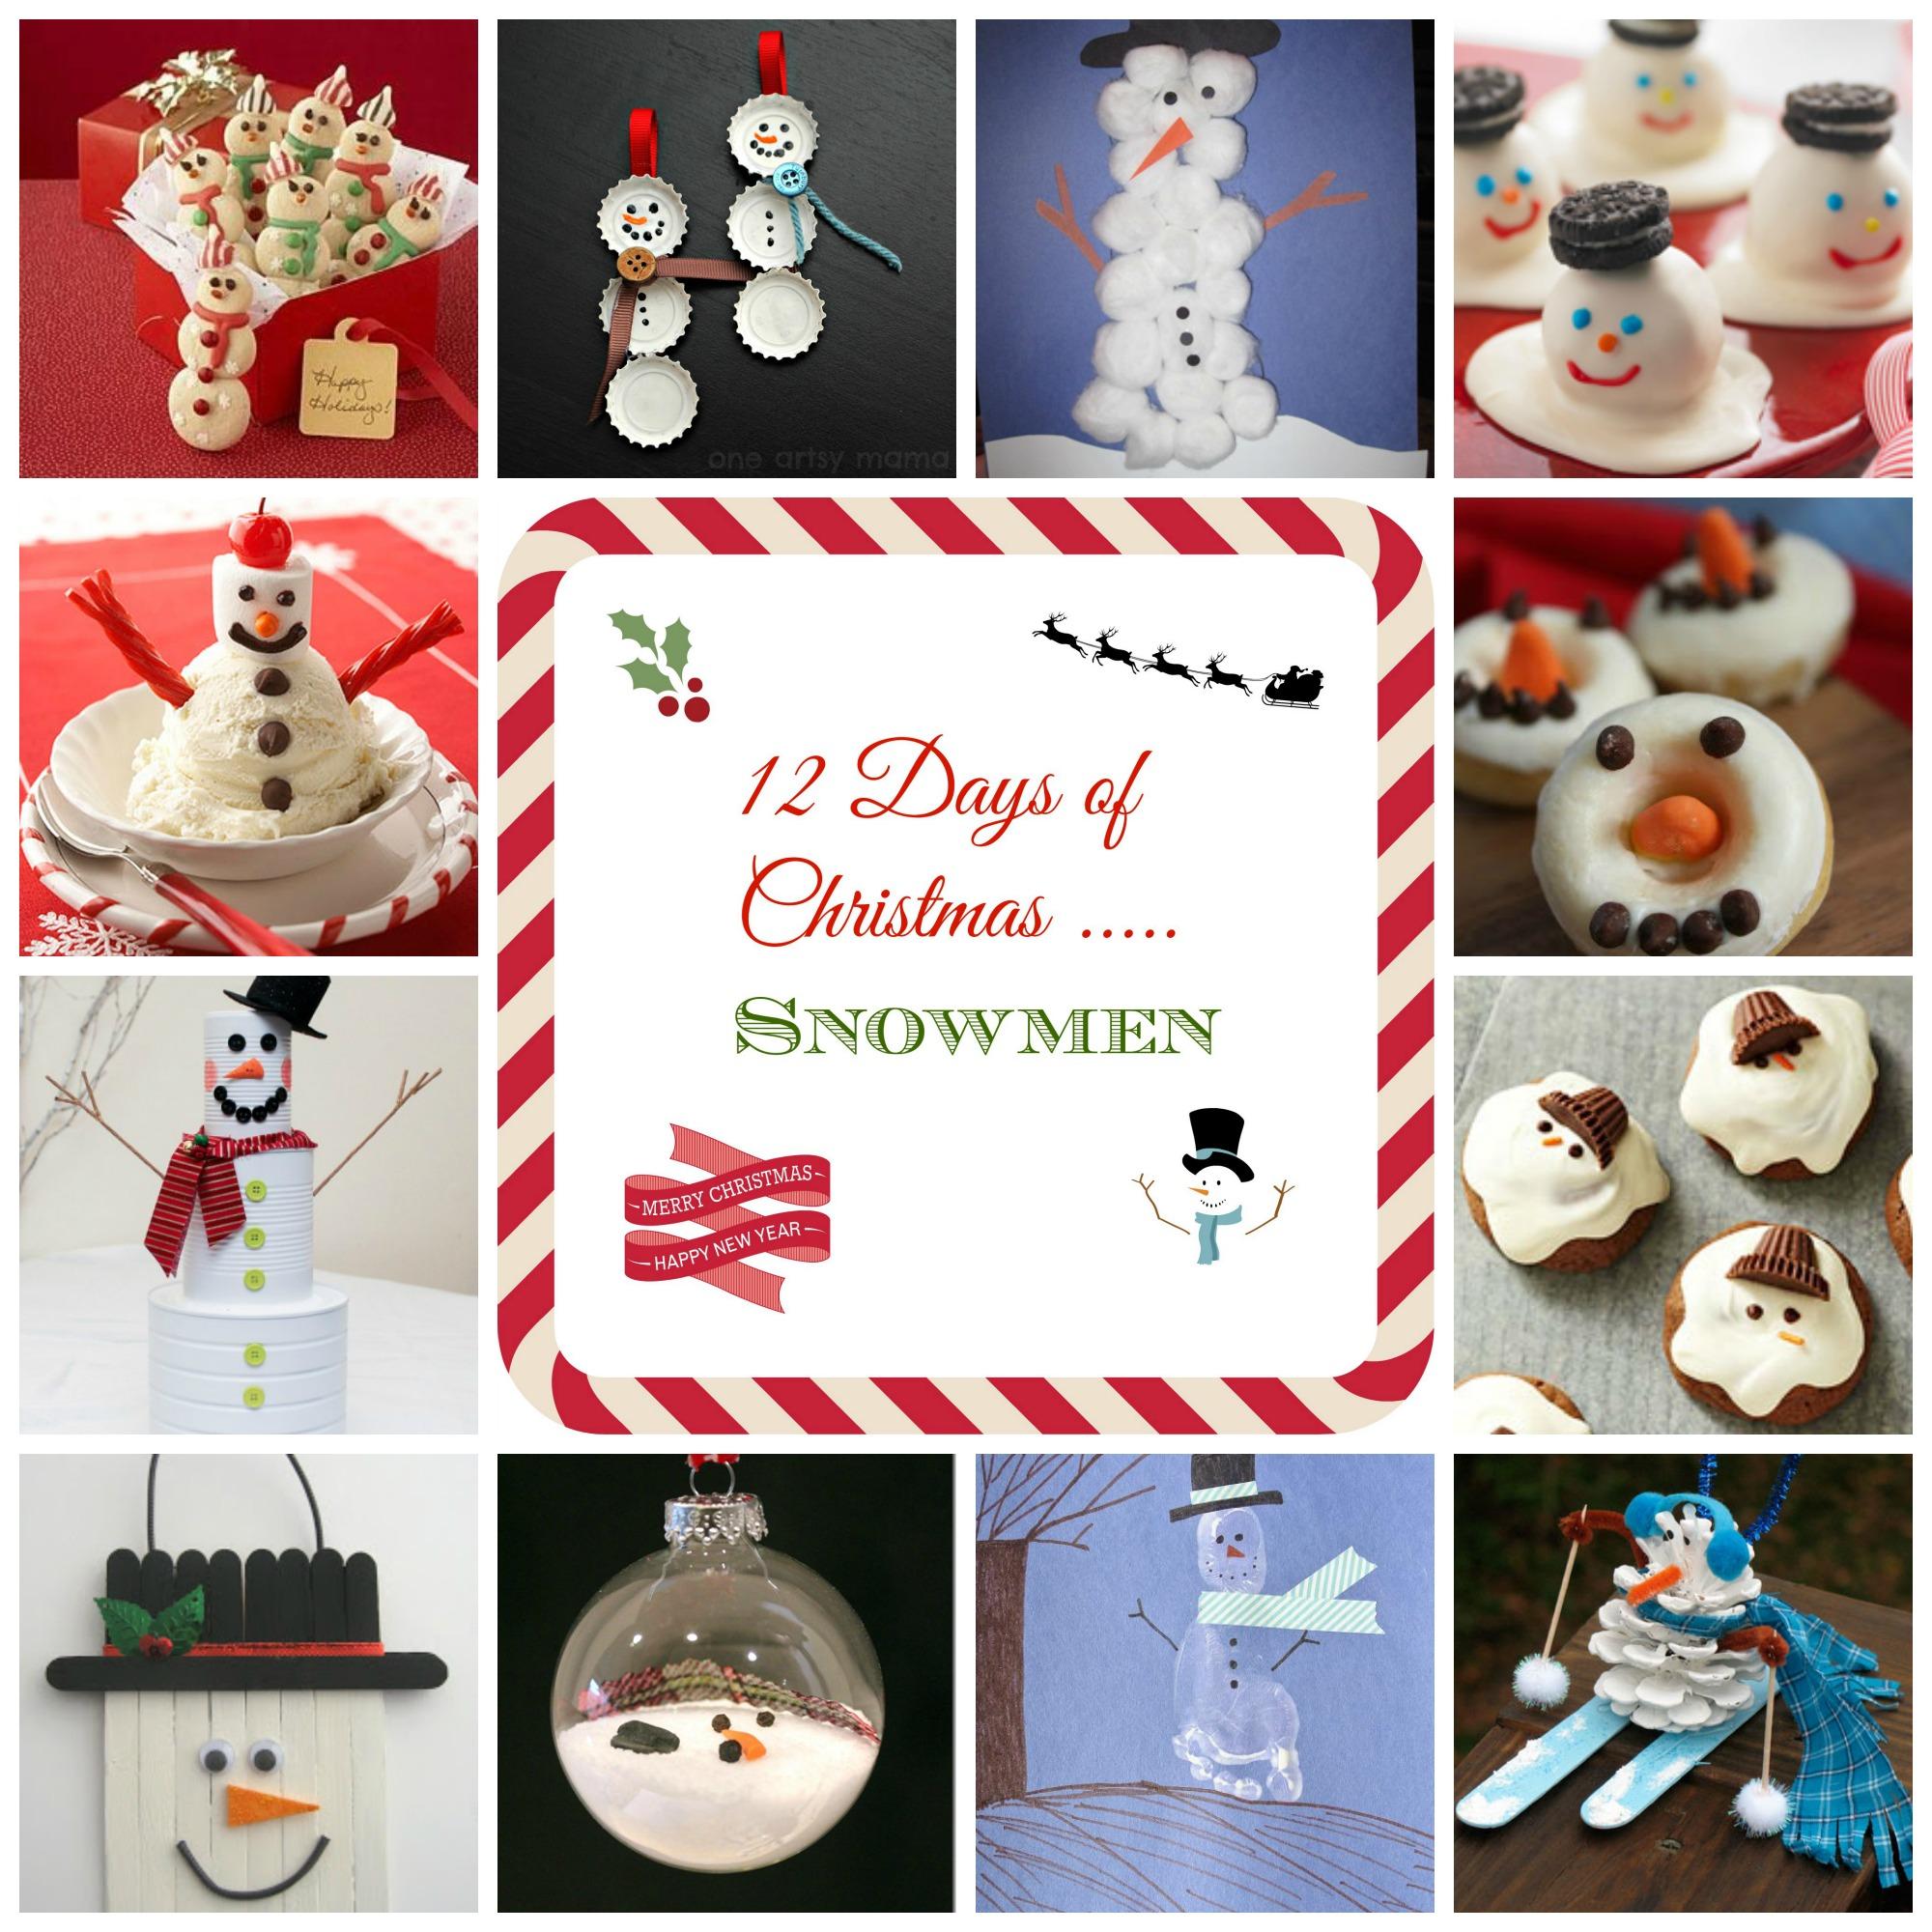 12 Days of Christmas - Snowmen